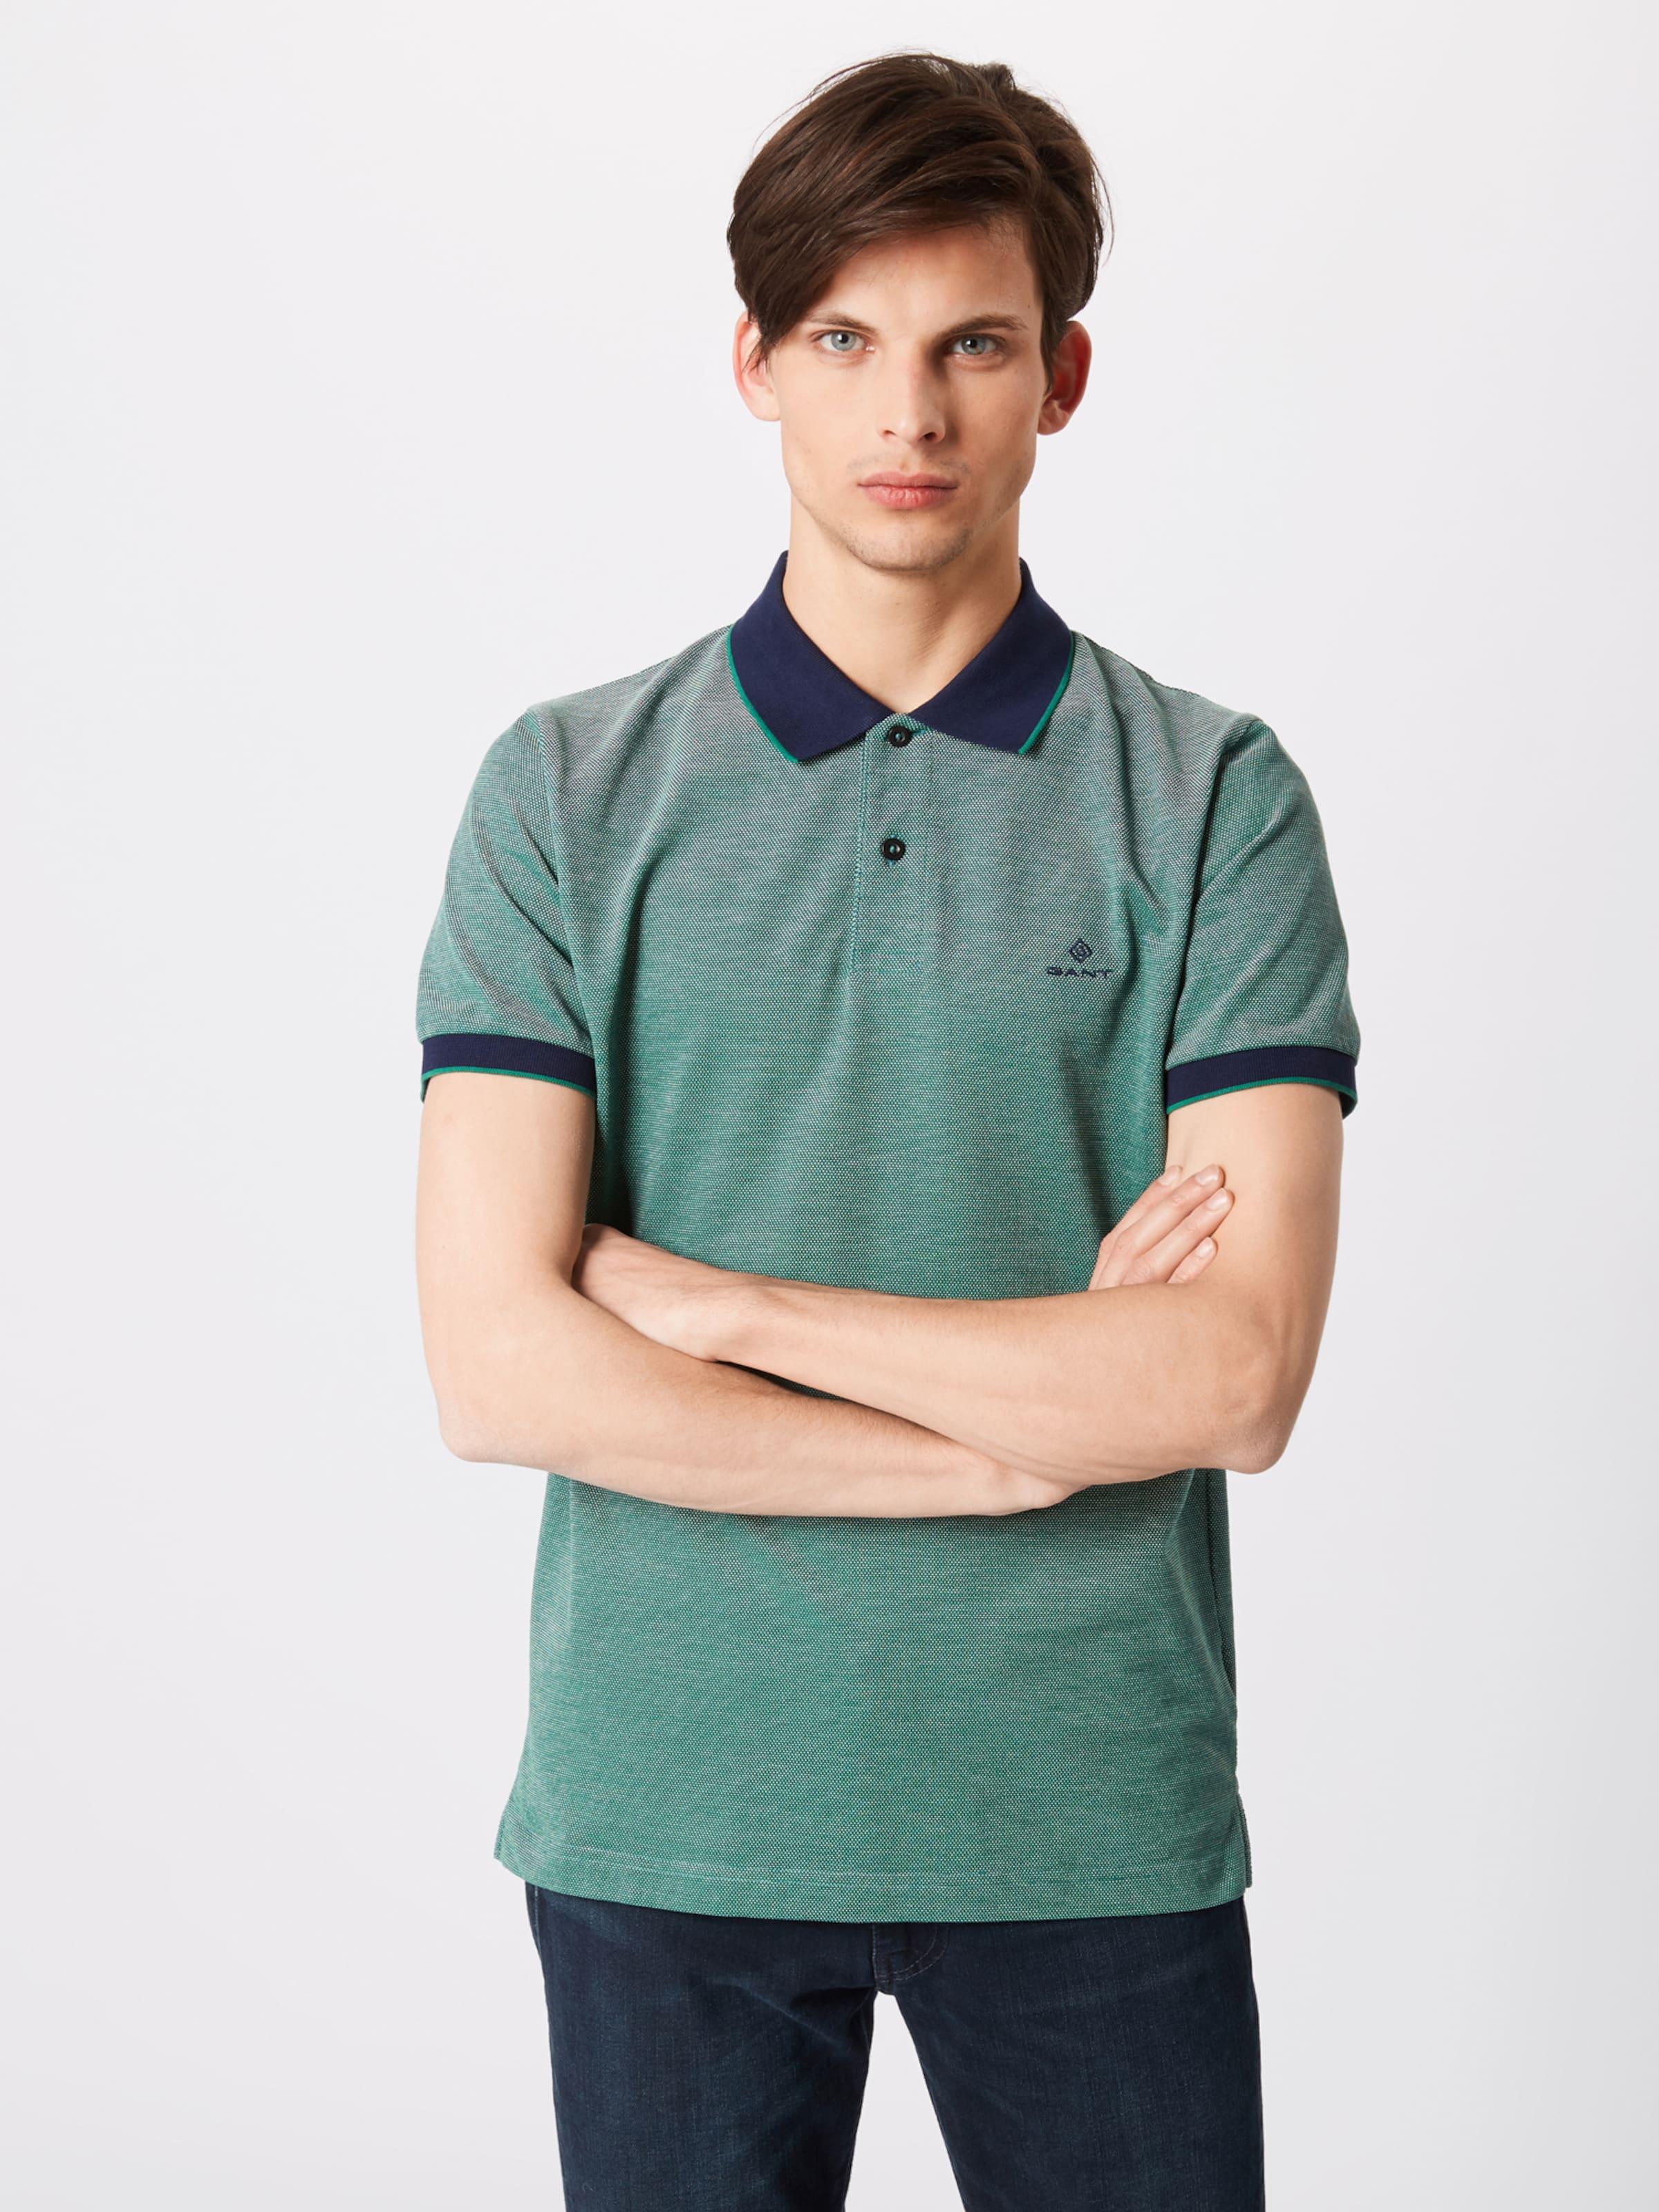 Ss Vert Foncé T Rugger' Oxford Pique Gant 'o14 shirt col En dCxBoe